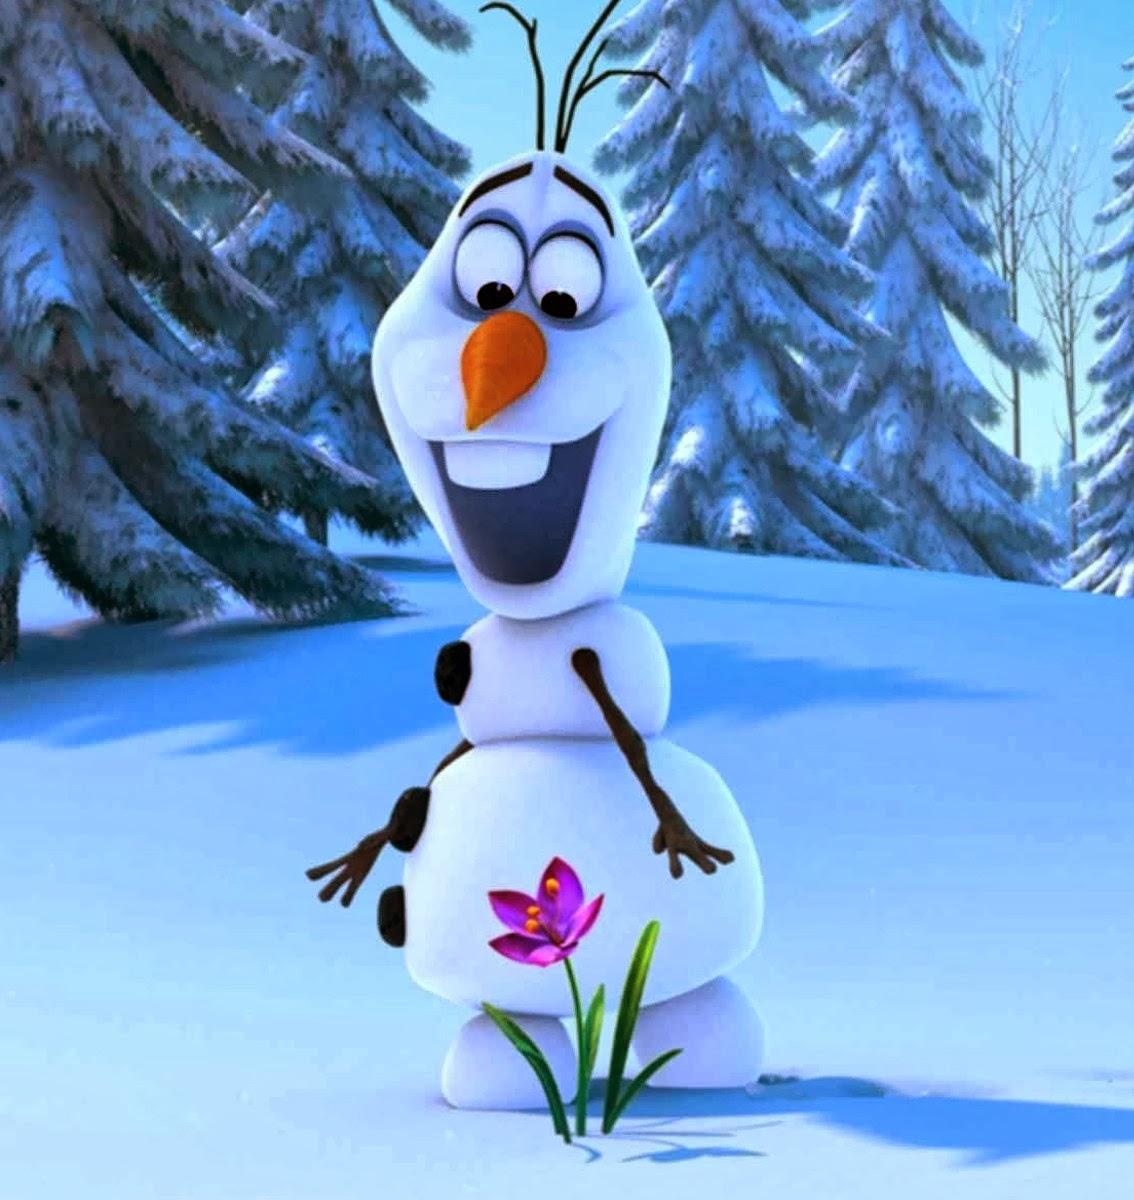 Imagens Frozen Uma Aventura Congelante Ideal huge hug: frozen- uma aventura congelante